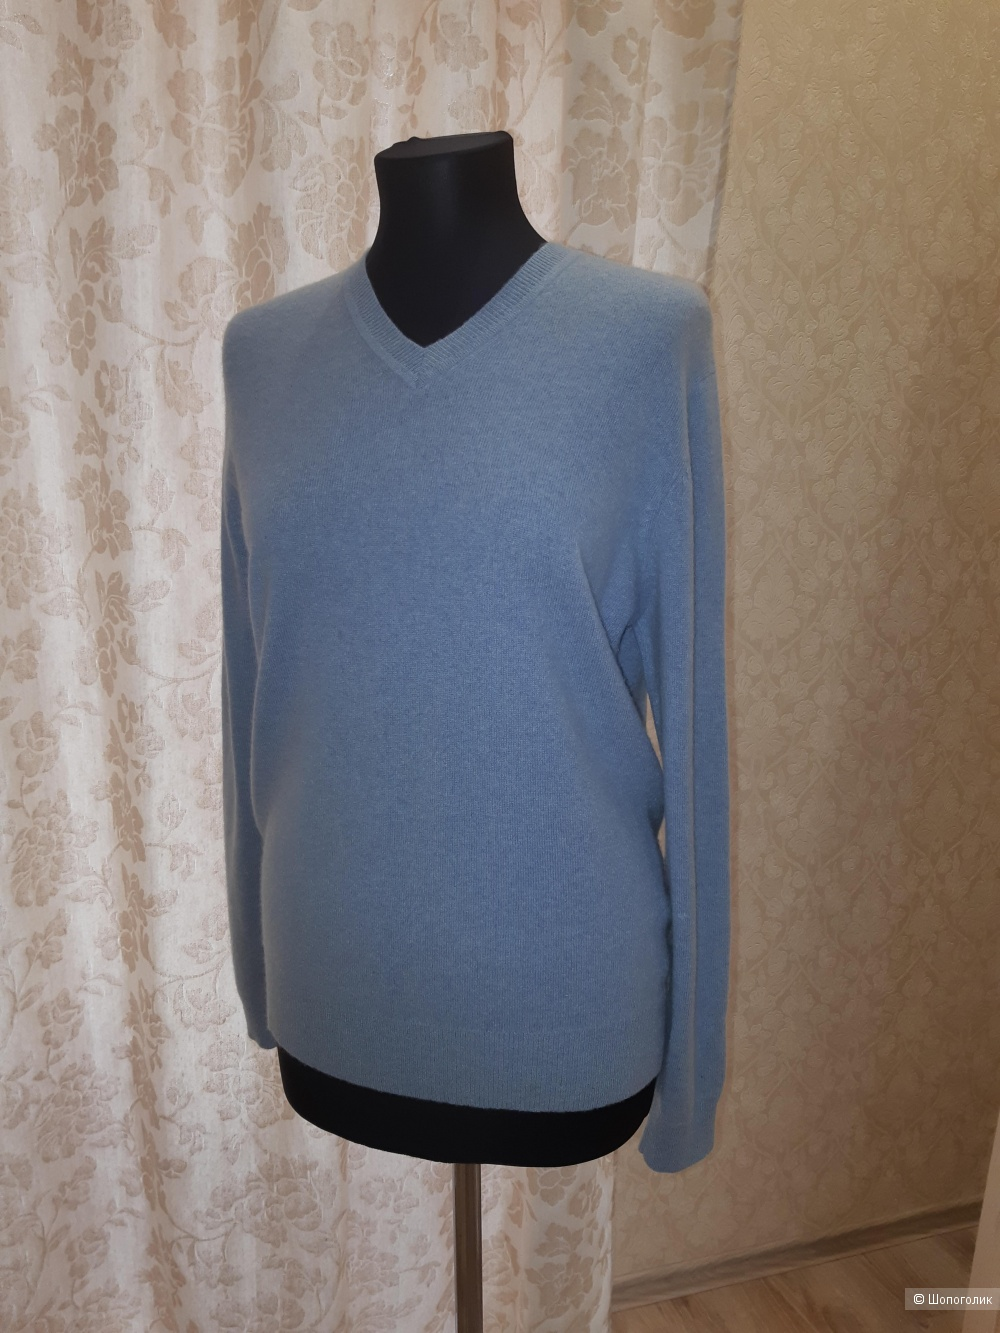 Кашемировый пуловер george collection, размер 46/48/50